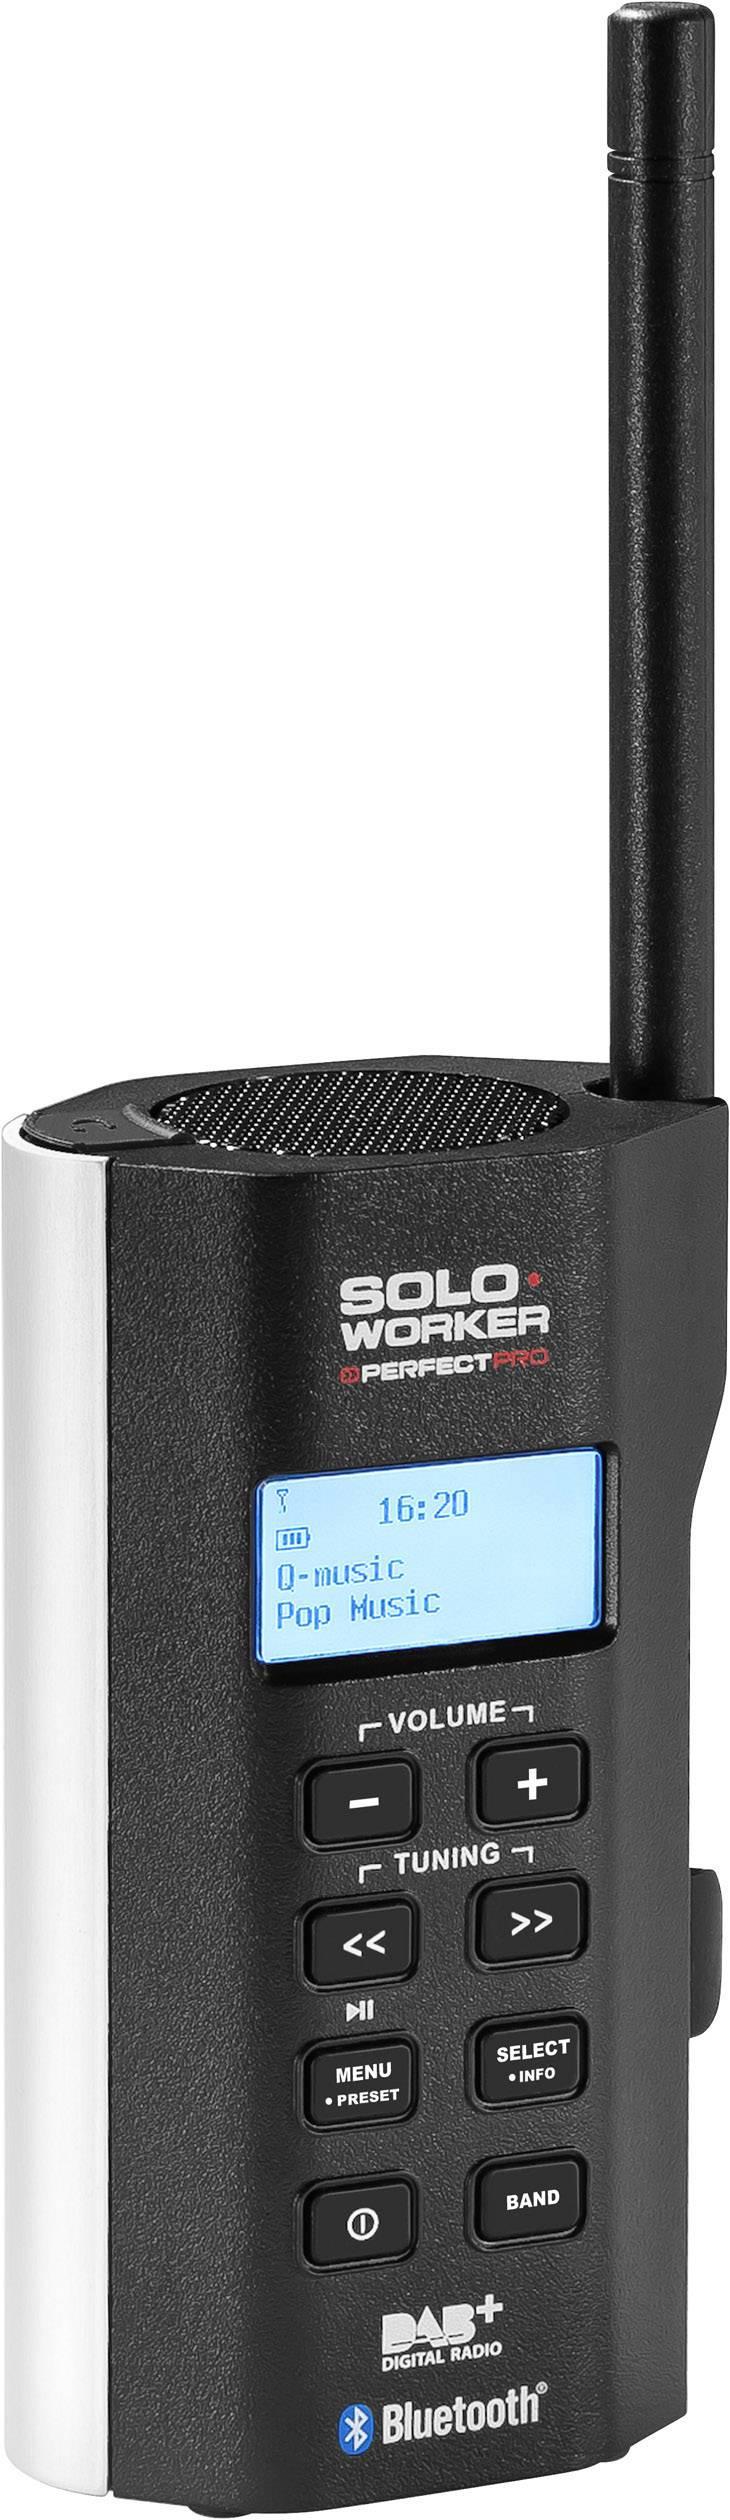 DAB+ outdoorové rádio PerfectPro Soloworker DAB+ BT, AUX, Bluetooth, DAB+, FM, černá